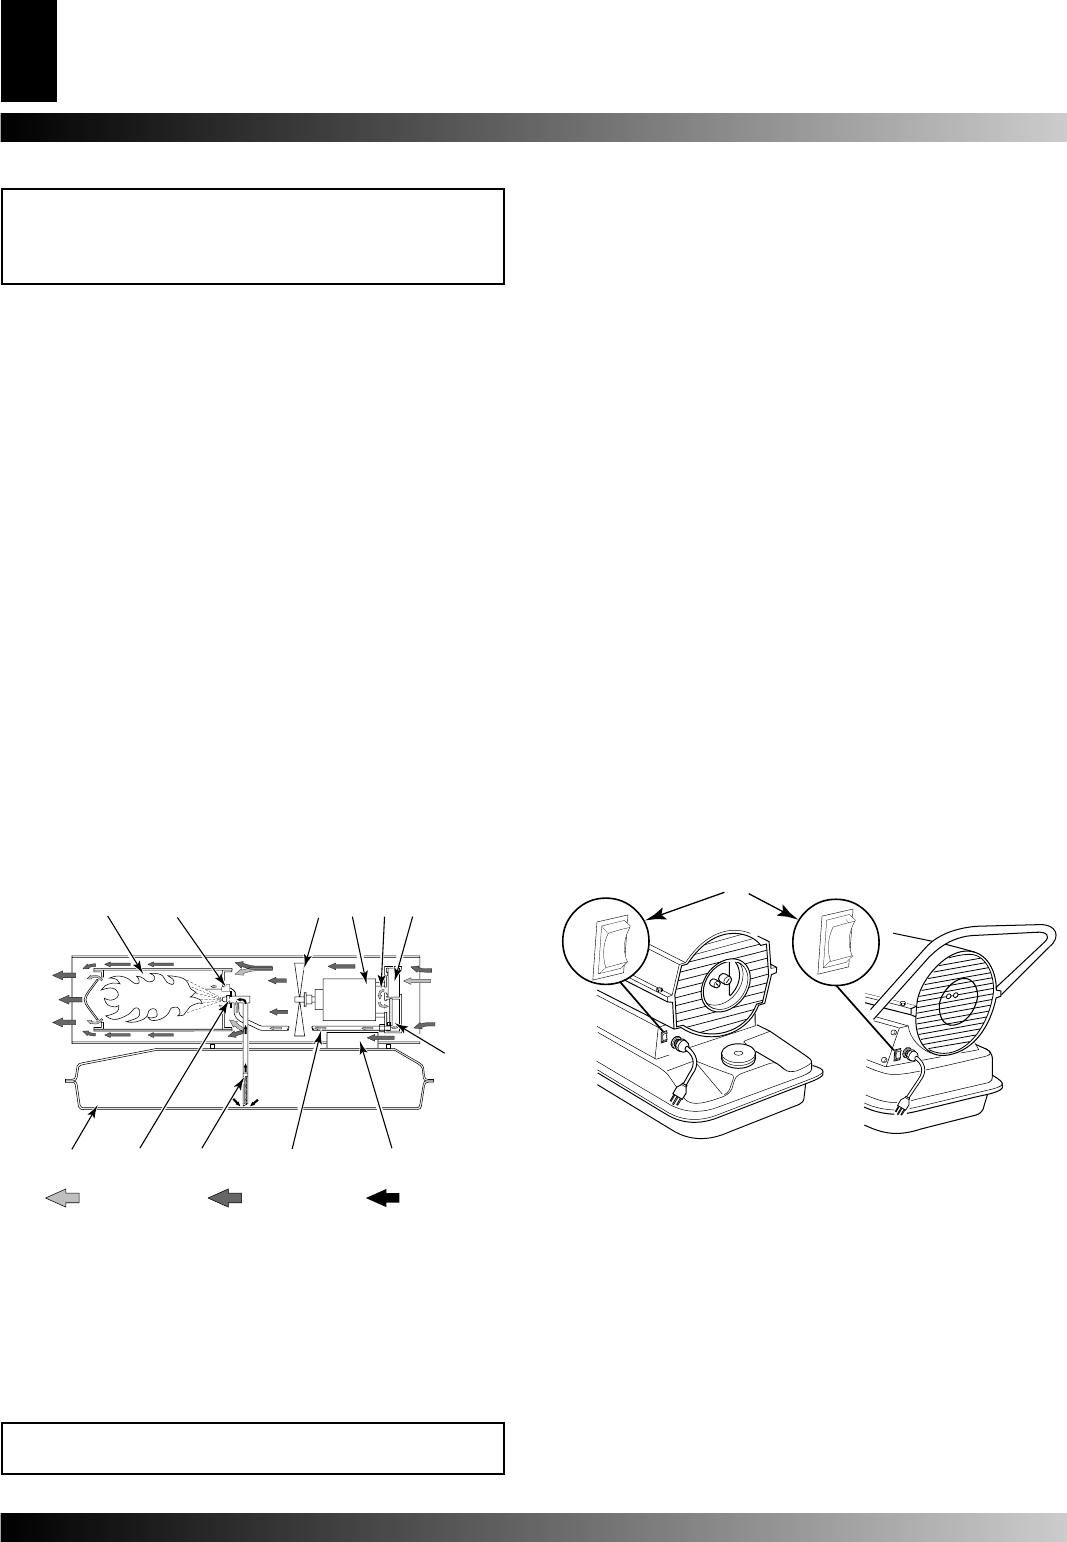 Handleiding Gude GD 20 IE 85092 (pagina 8 van 56) (Deutsch, English ...